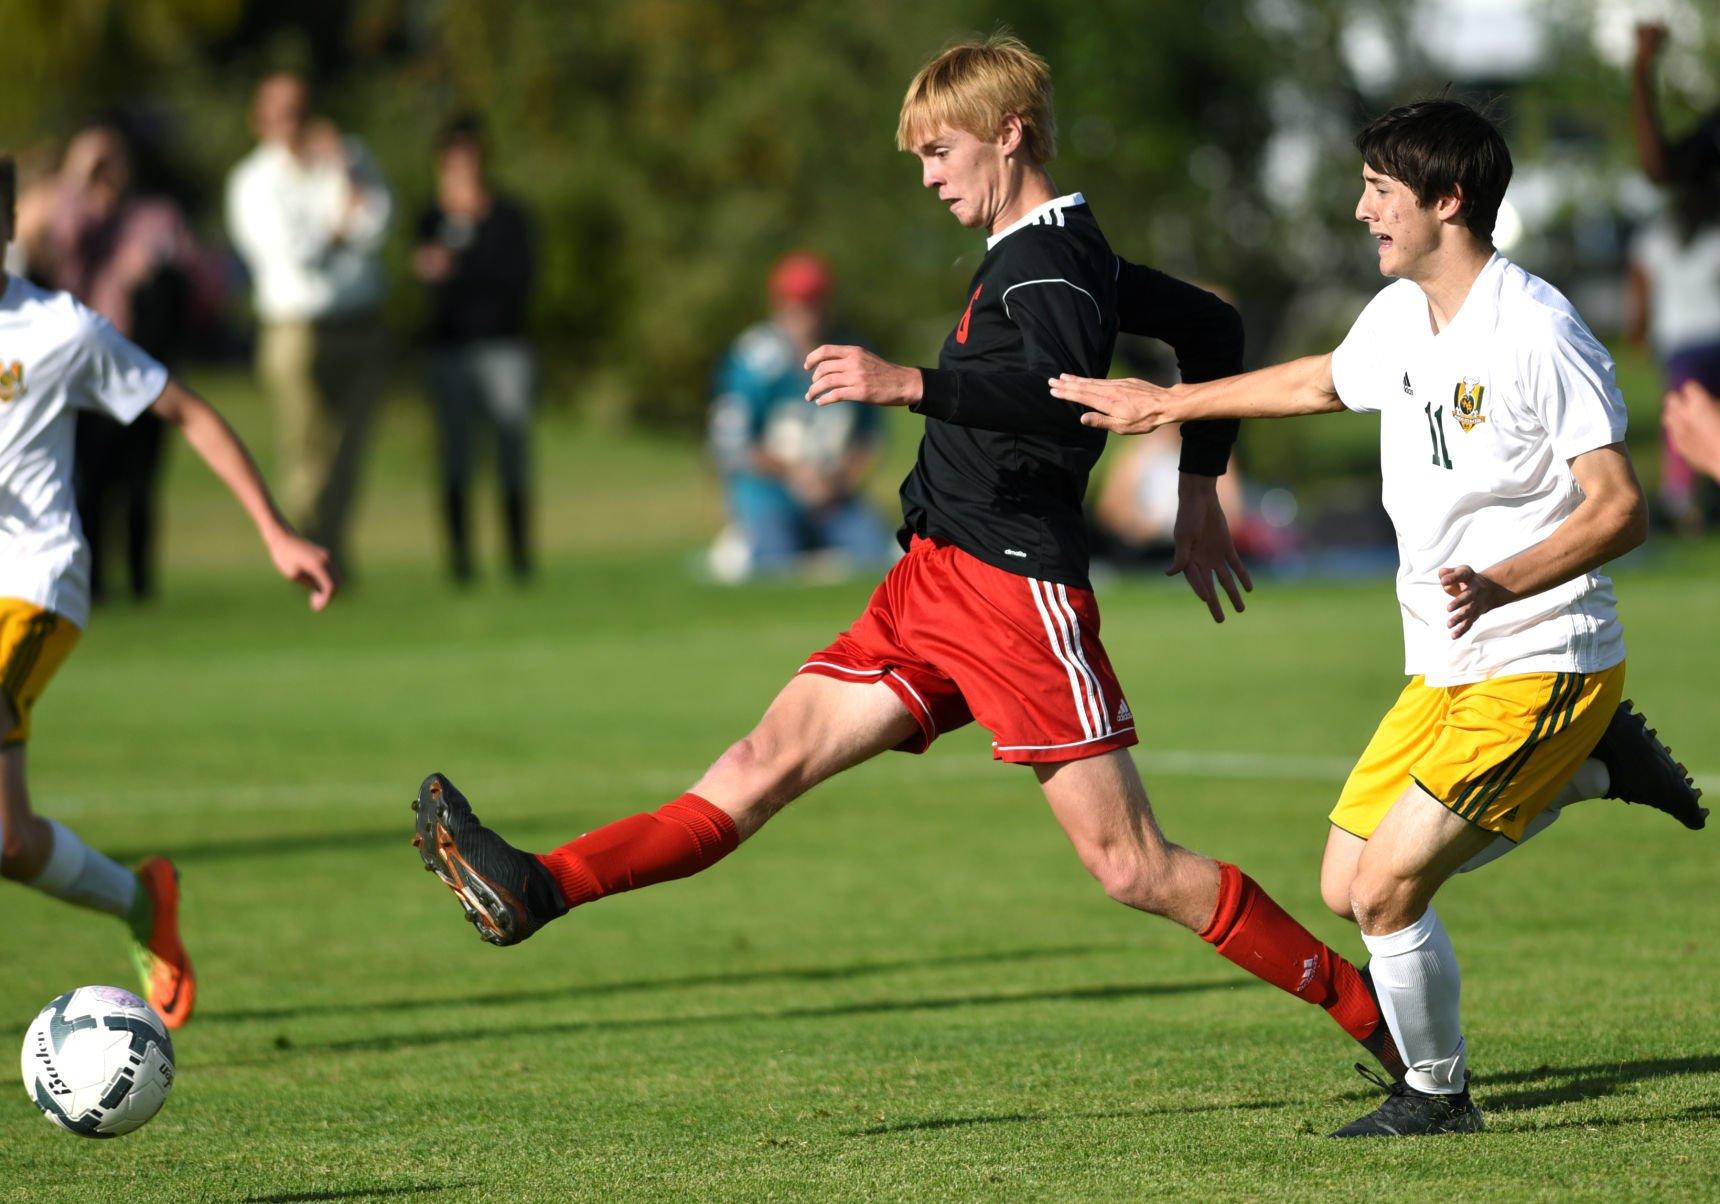 BHS Soccer v. CMR (copy)